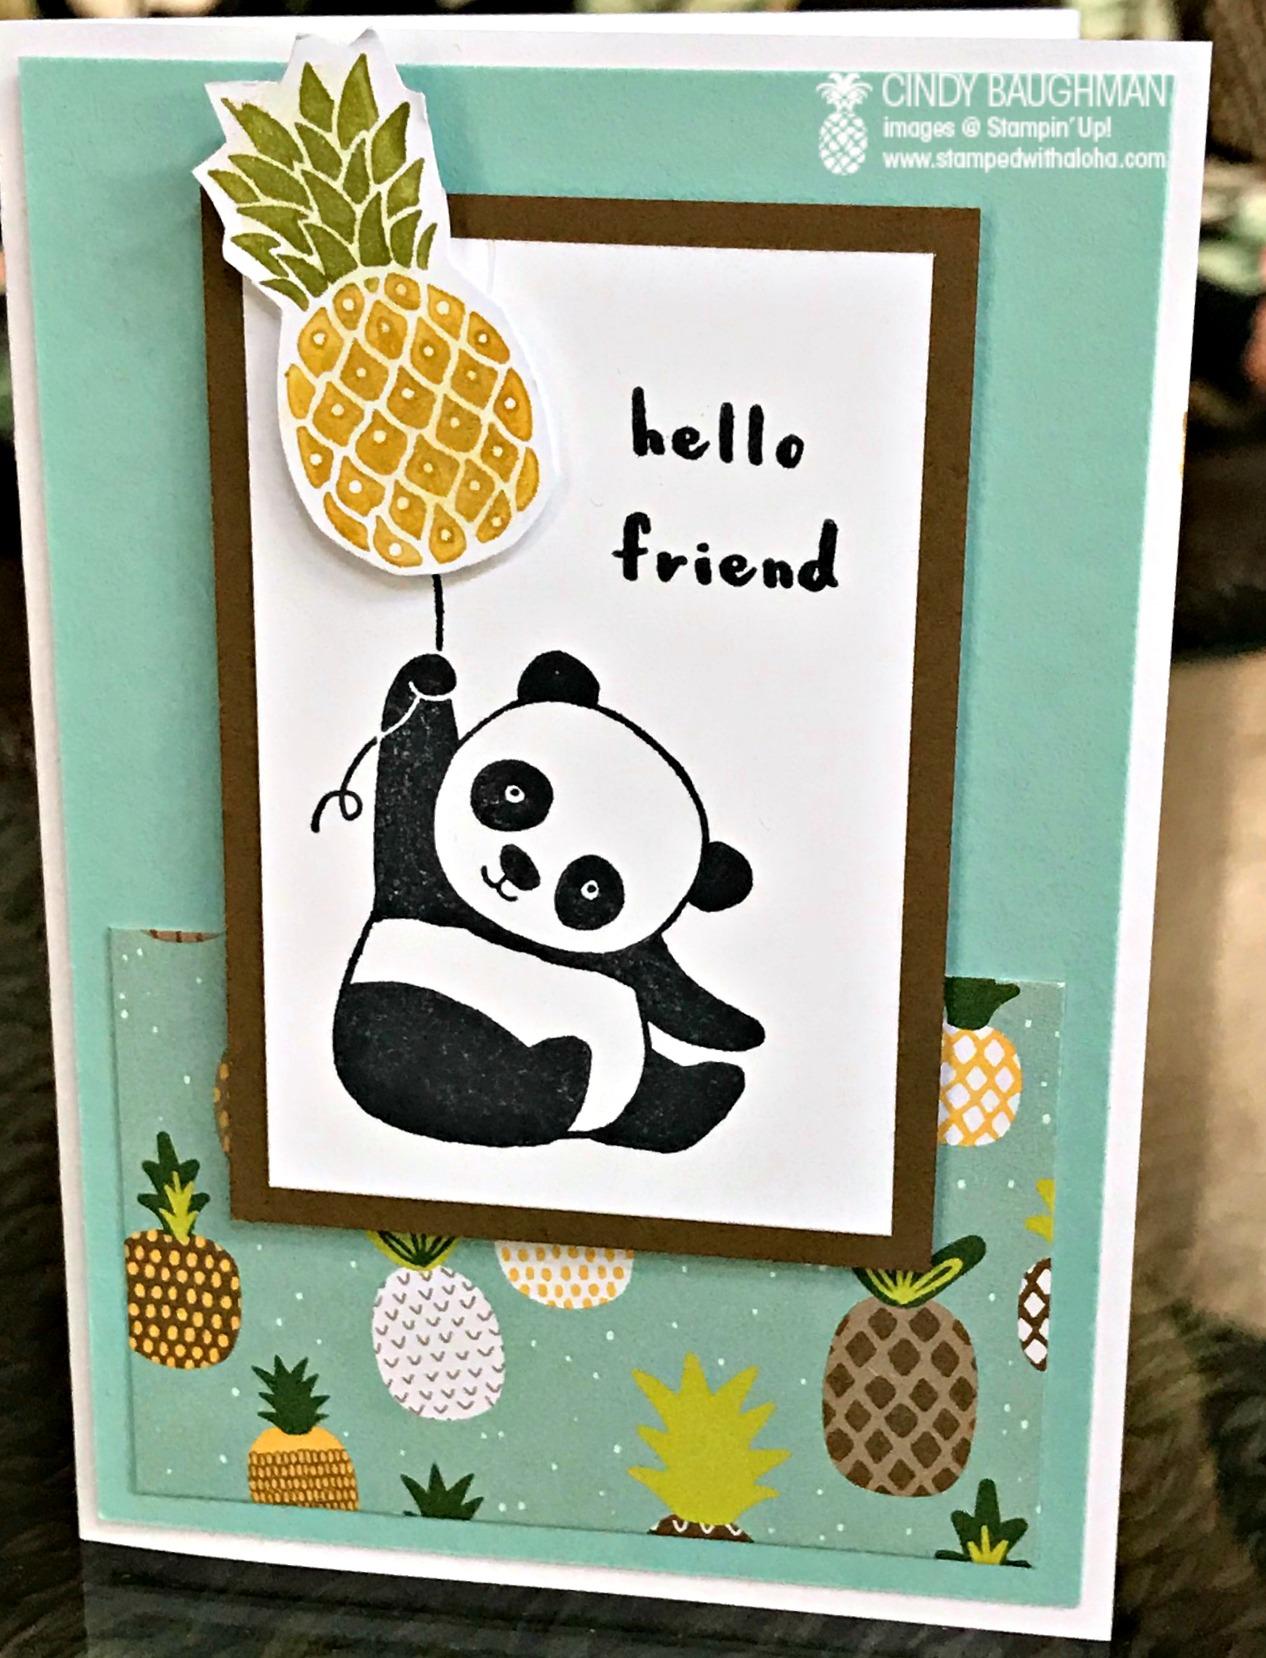 Pineapple Panda Note Card - www.stampedwithaloha.com